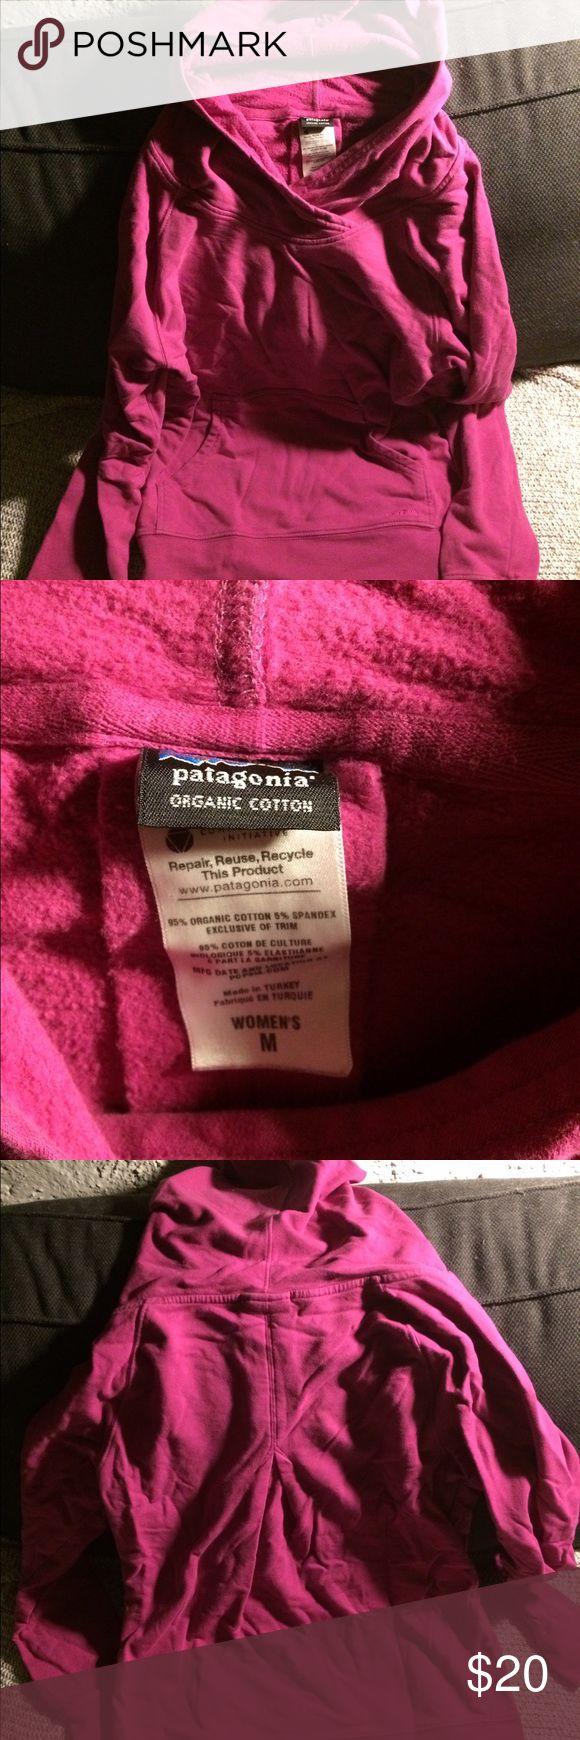 Patagonia hoodie Fuchsia lightweight stretchy hoodie, size medium, minimal wear, no stains/rips etc. Patagonia Tops Sweatshirts & Hoodies